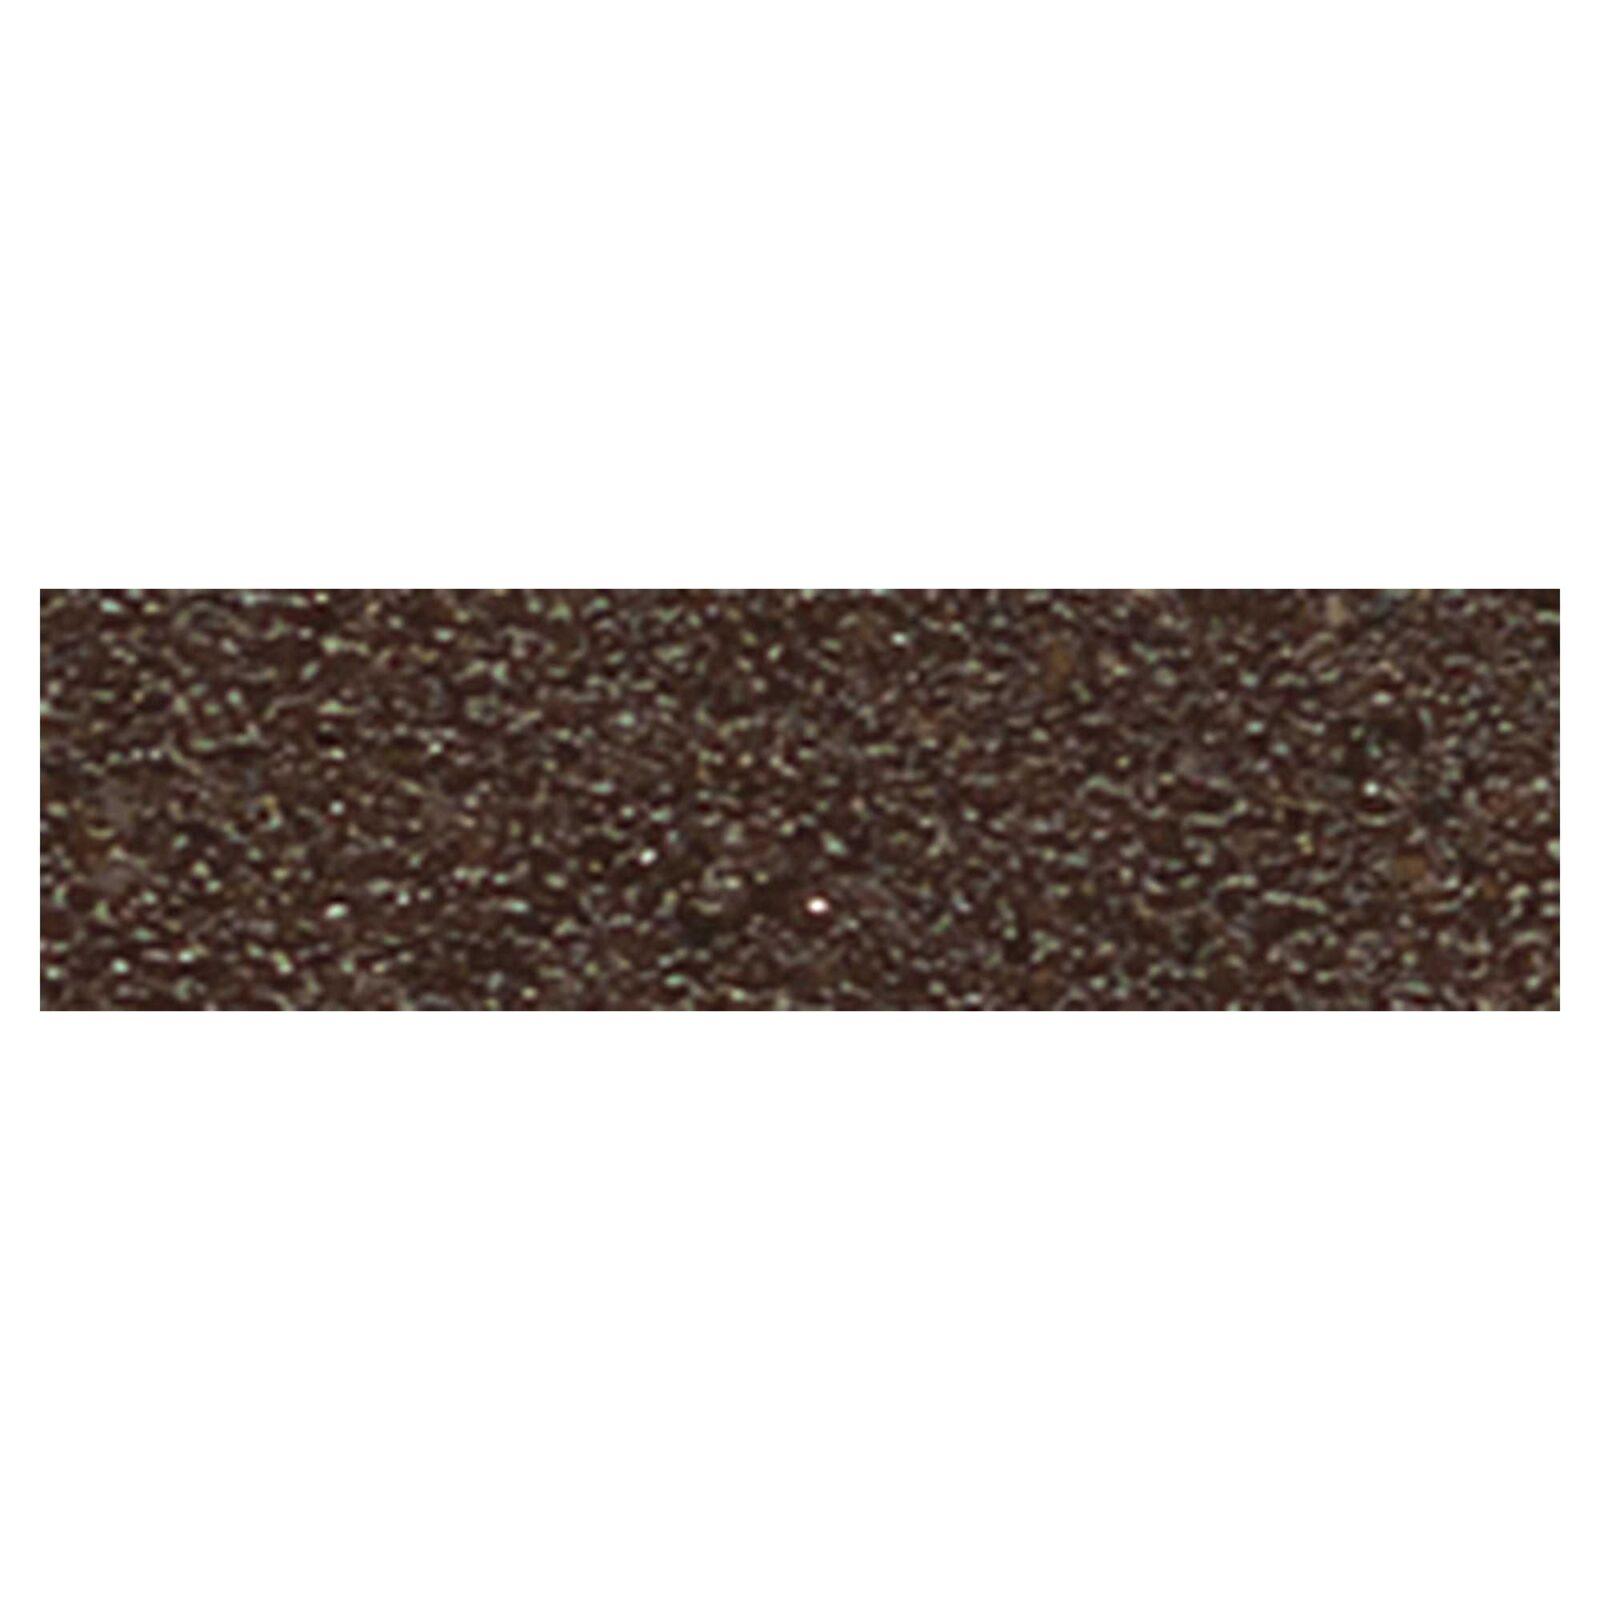 Мойка G-10(шоколад) (700х500х195) из гранитной крошки+сифон